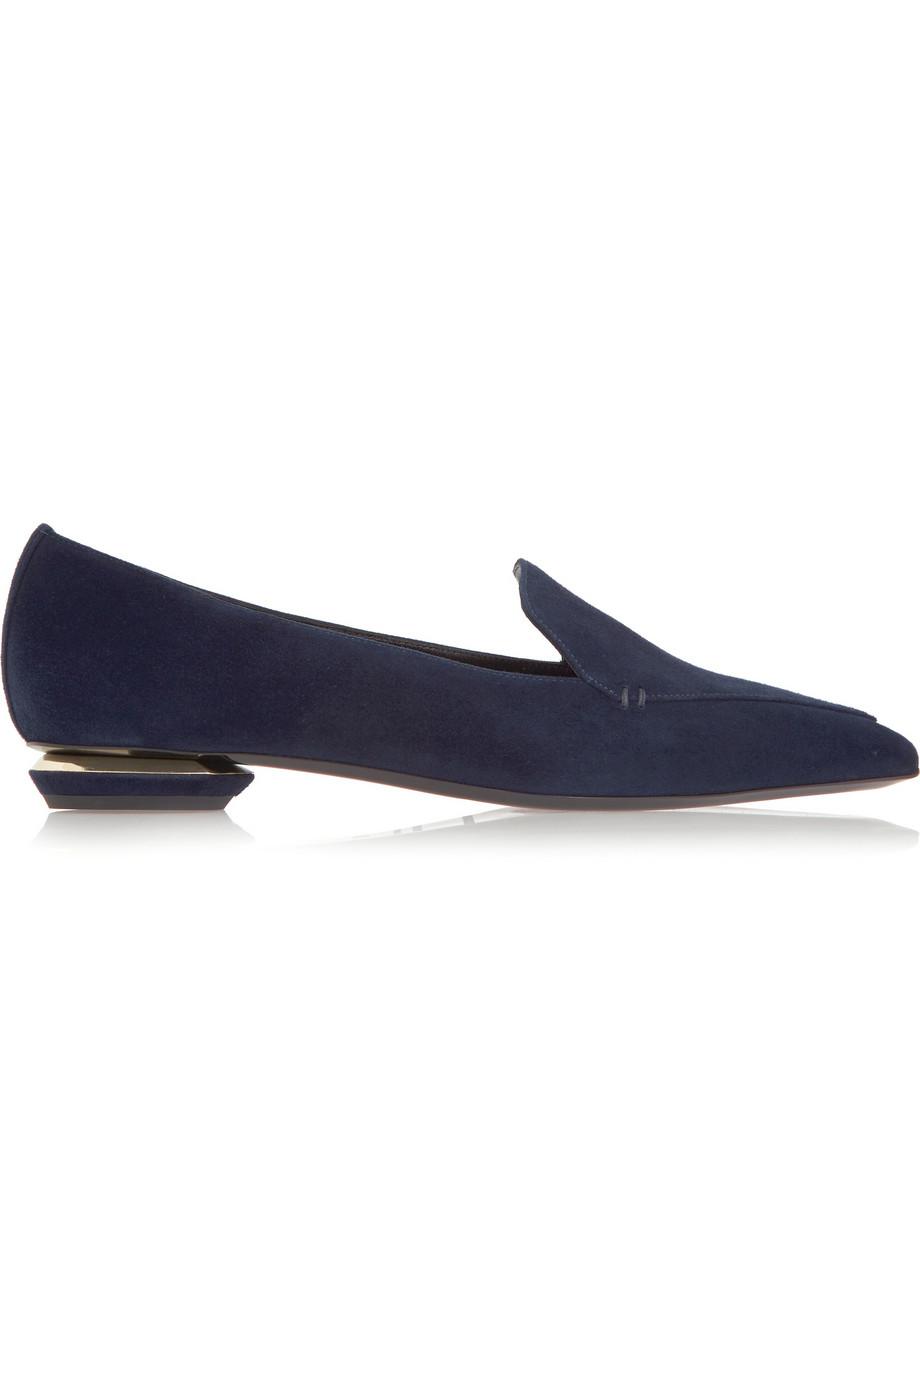 Nicholas Kirkwood - chaussures (380€)